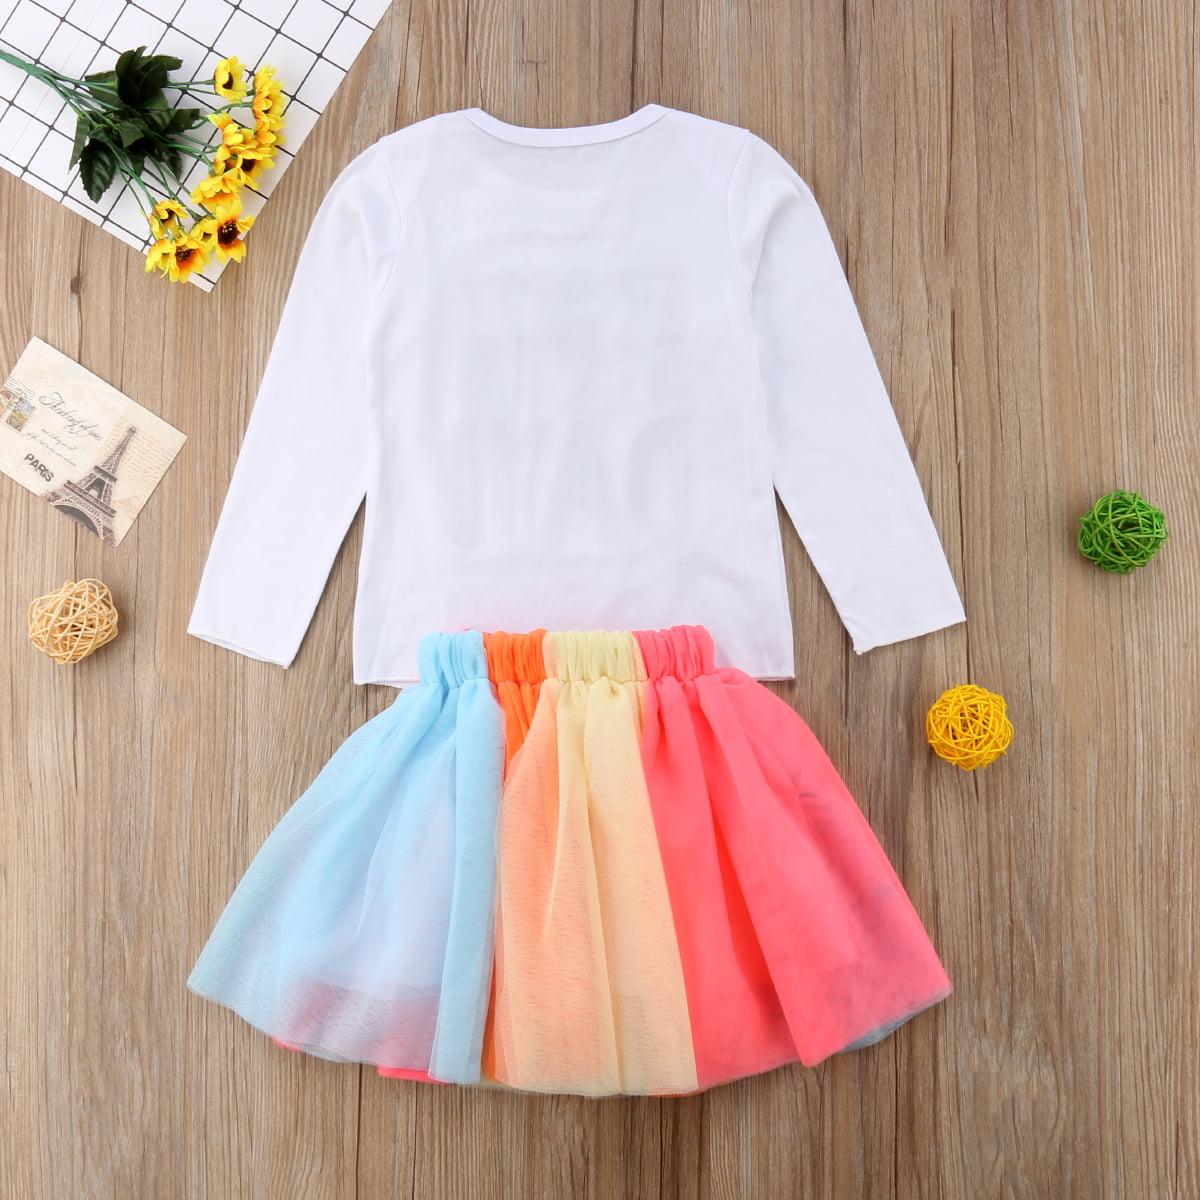 b9a6e1f1aa Gaono - Baby Kid Girls Birthday Outfits Long Sleve T-shirt+Rainbow Tutu  Skirt Set - Walmart.com